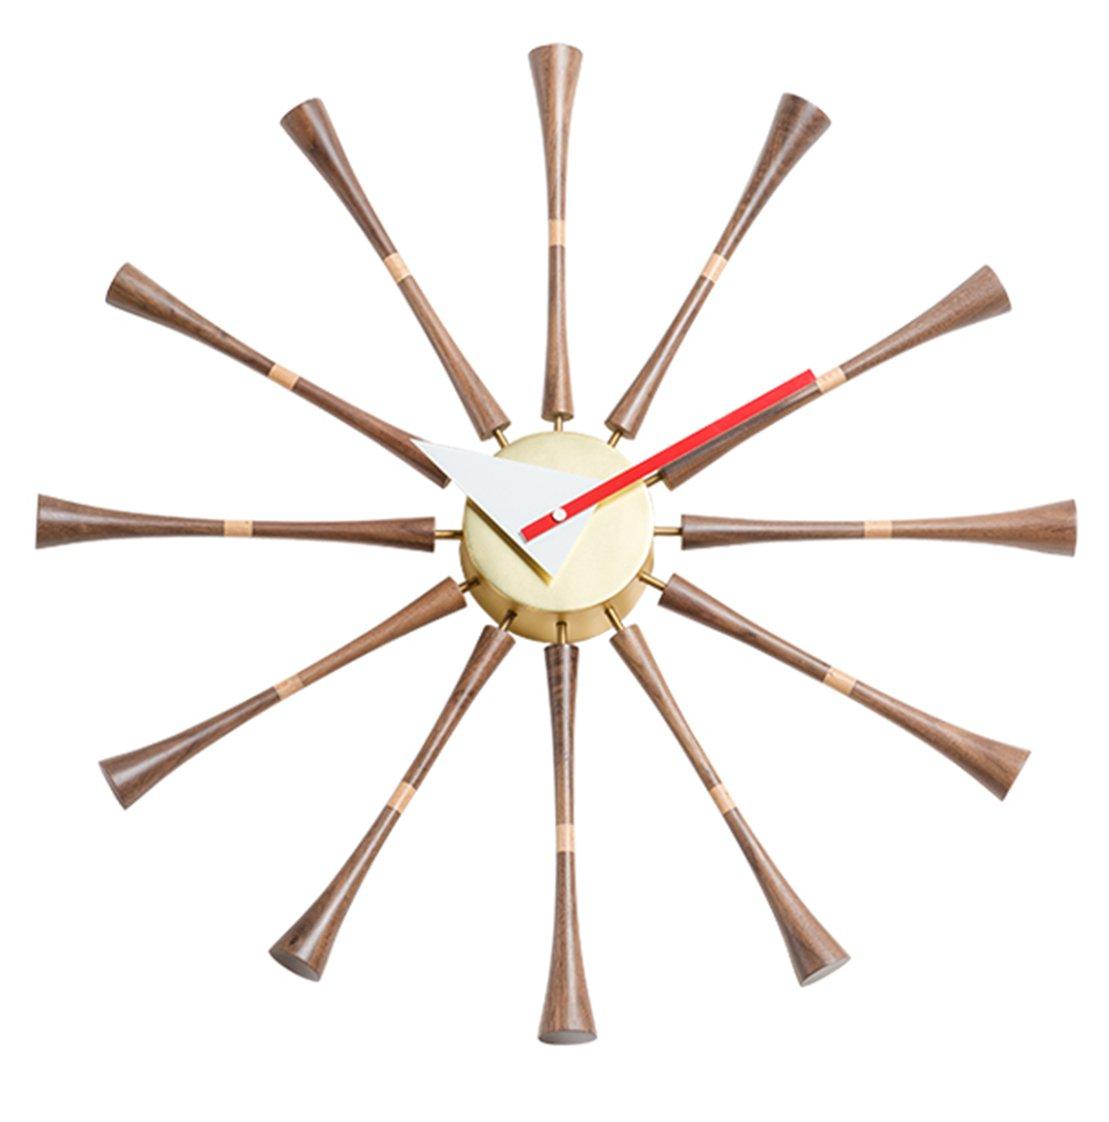 MLF®スピンドルクロック ジョージ ネルソン デザイナー壁時計 B01IT7ITEO スピンドルクロック スピンドルクロック